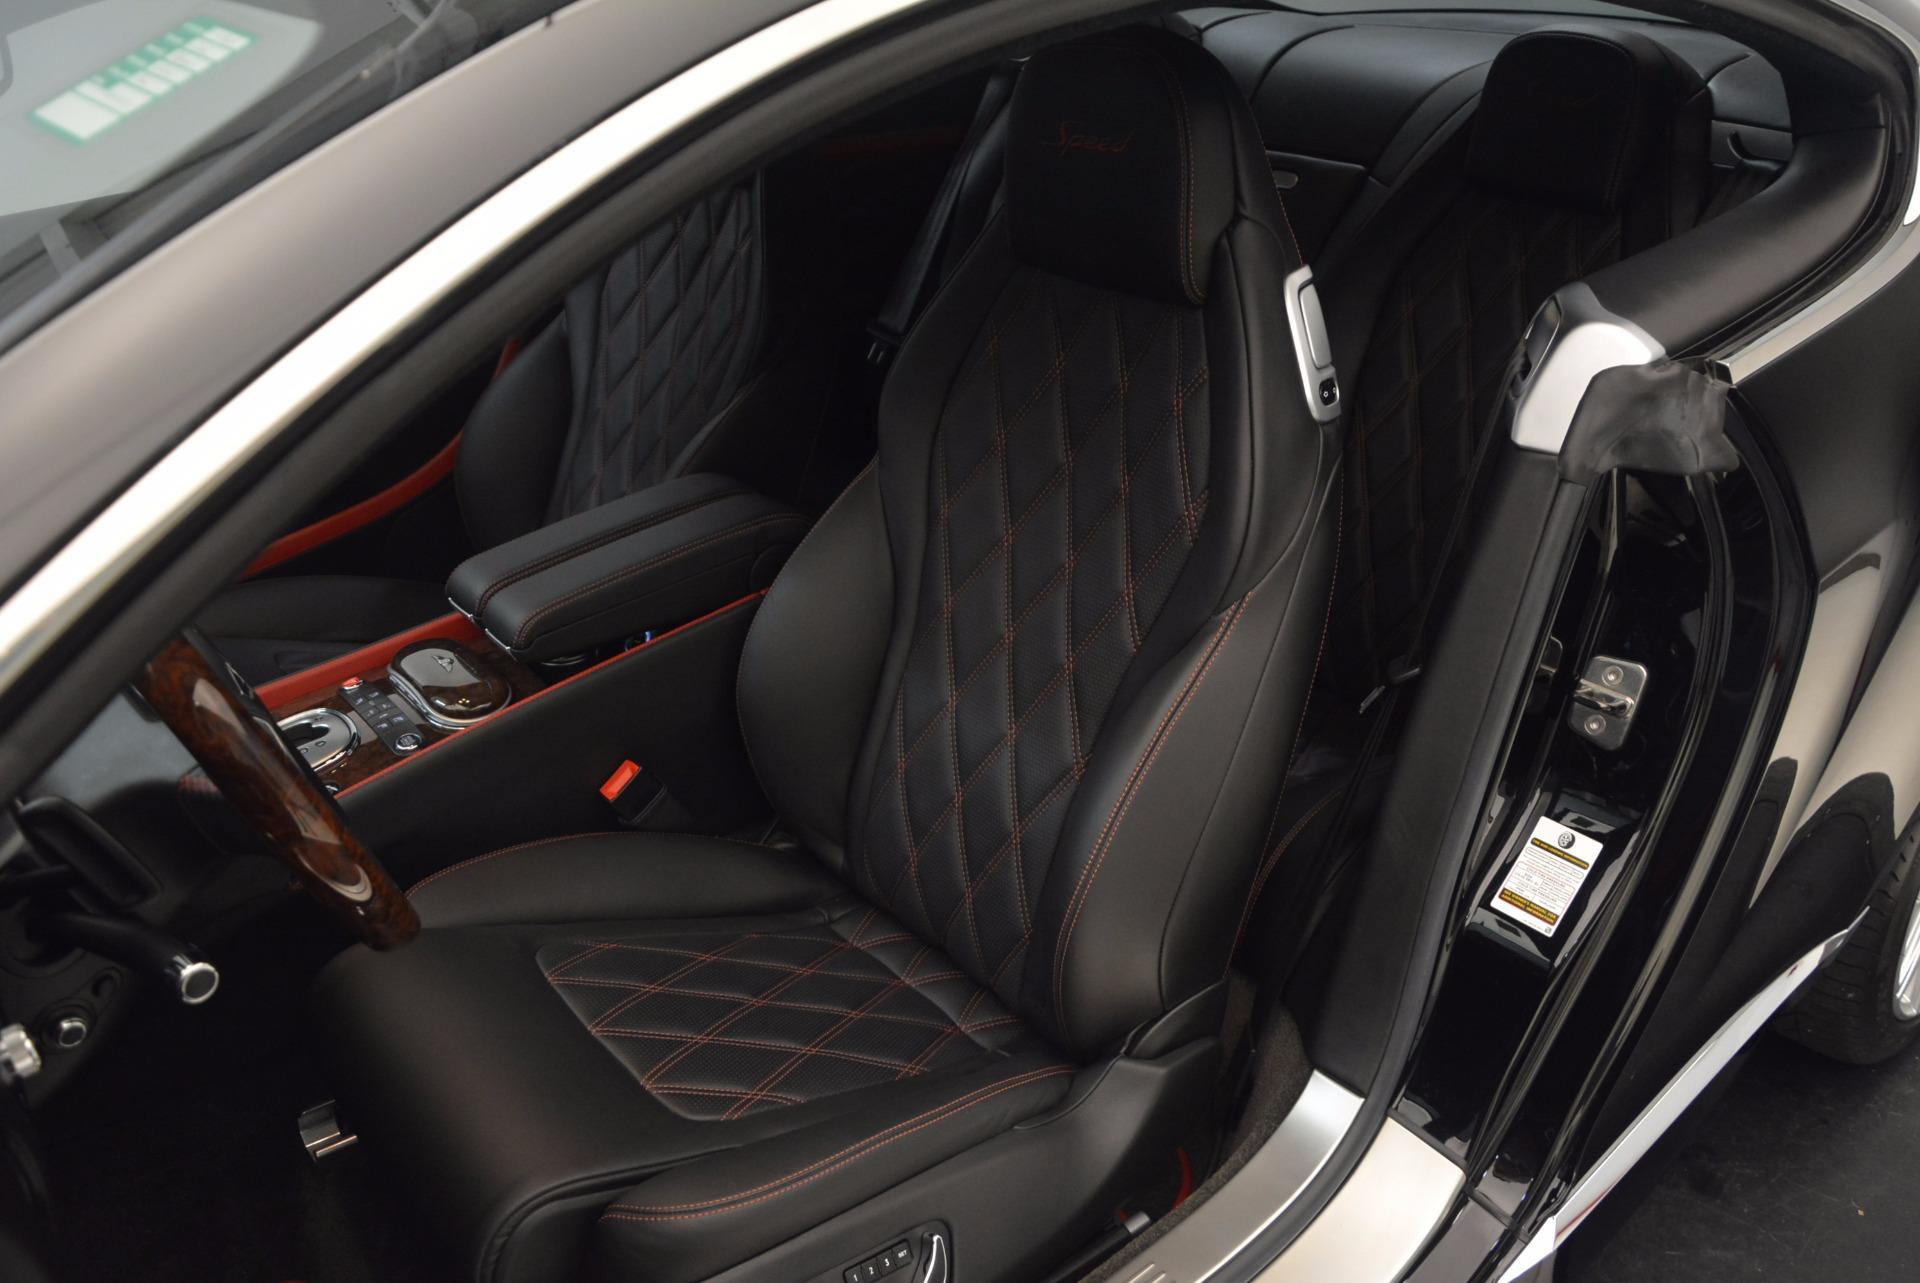 Used 2015 Bentley Continental GT Speed For Sale In Westport, CT 1646_p24